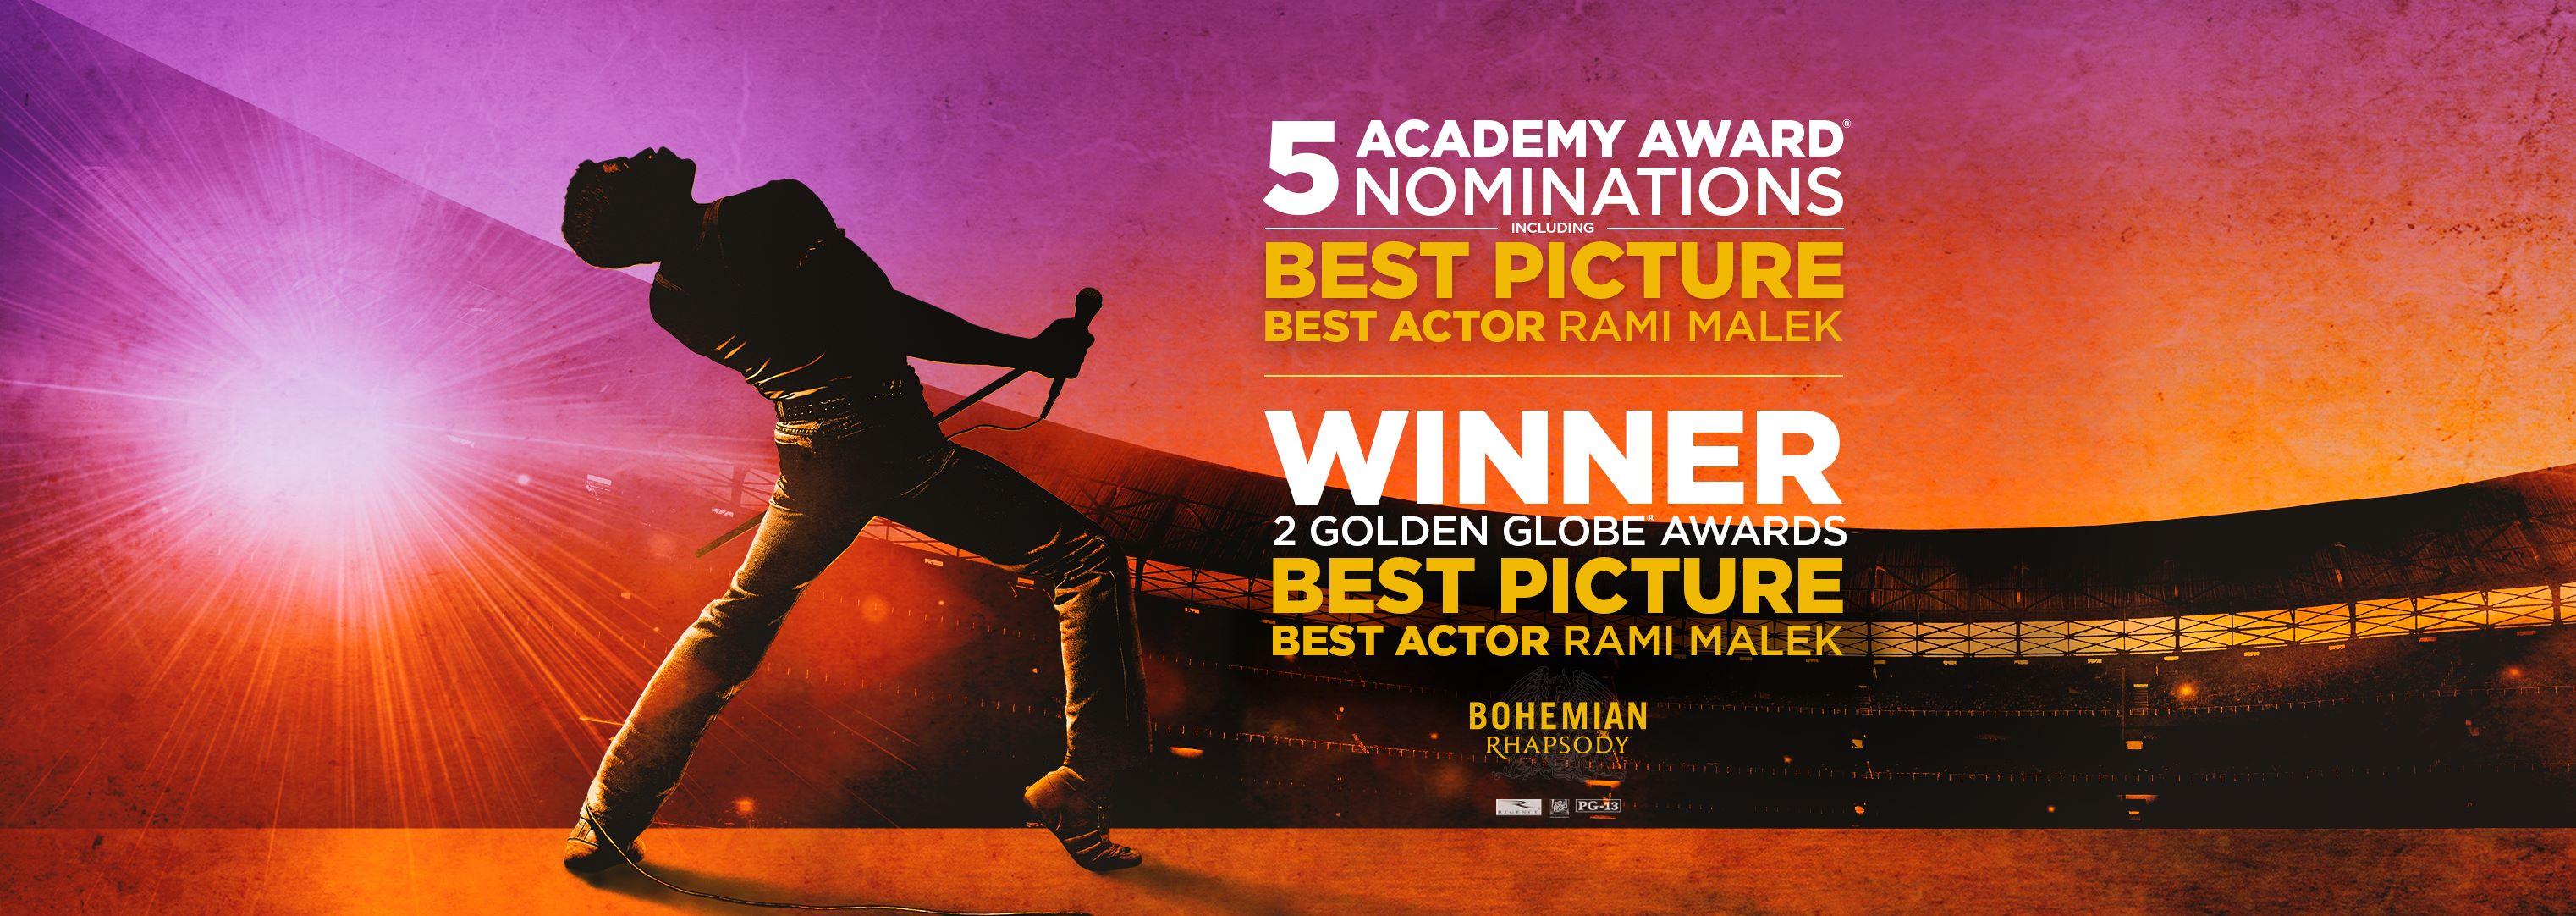 bohemian rhapsody oscar nominations